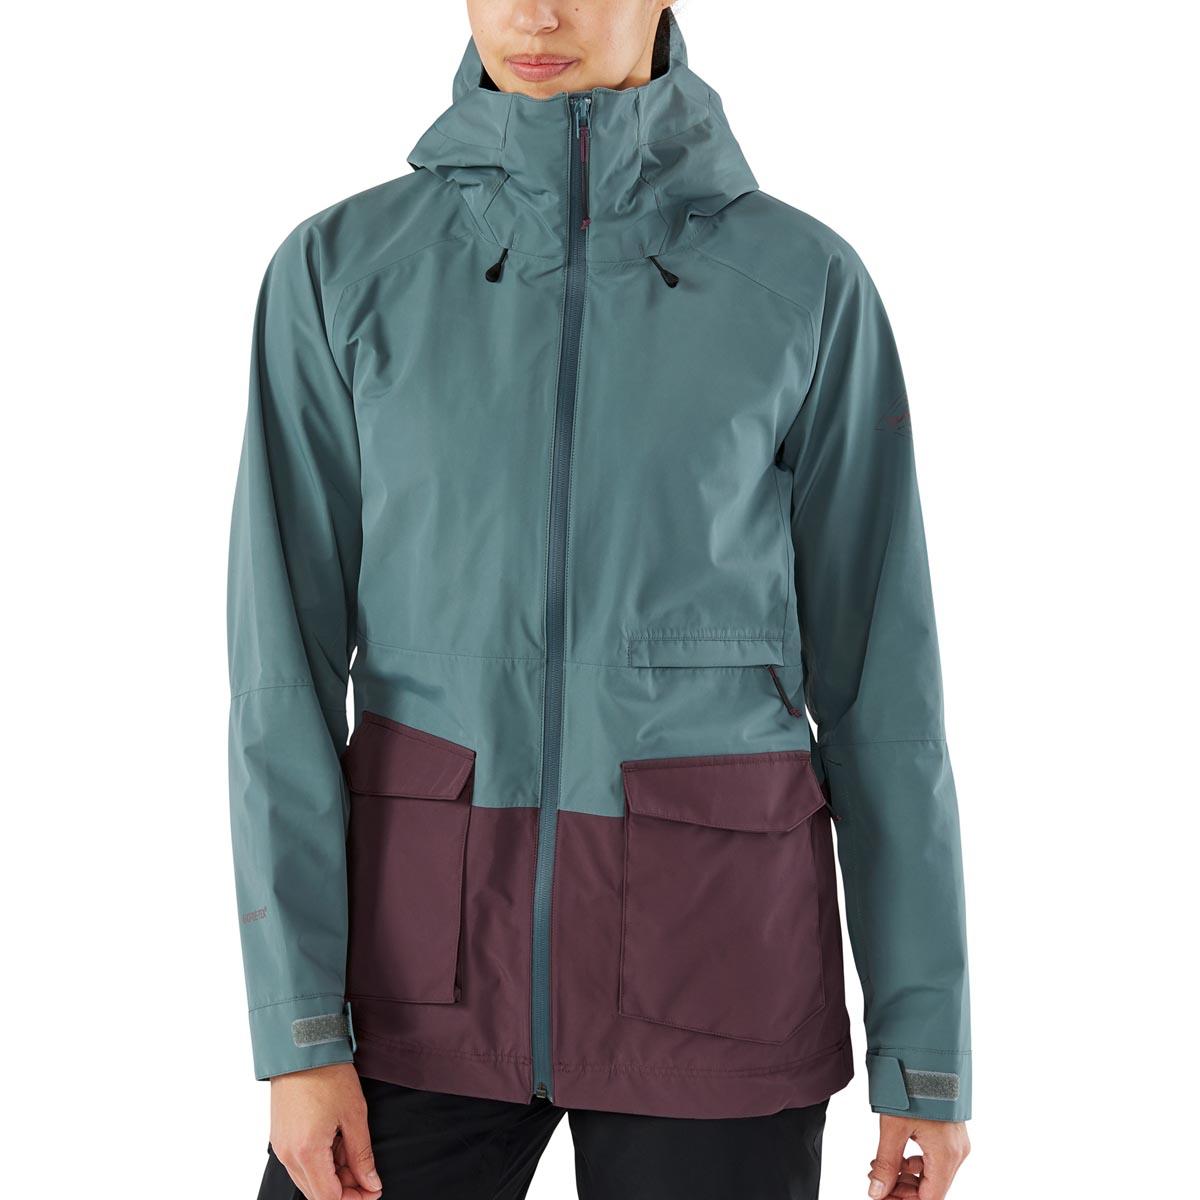 Dakine Remington Pure 2L Jacket Ski Snowboard Jacket Balsam Amethyst